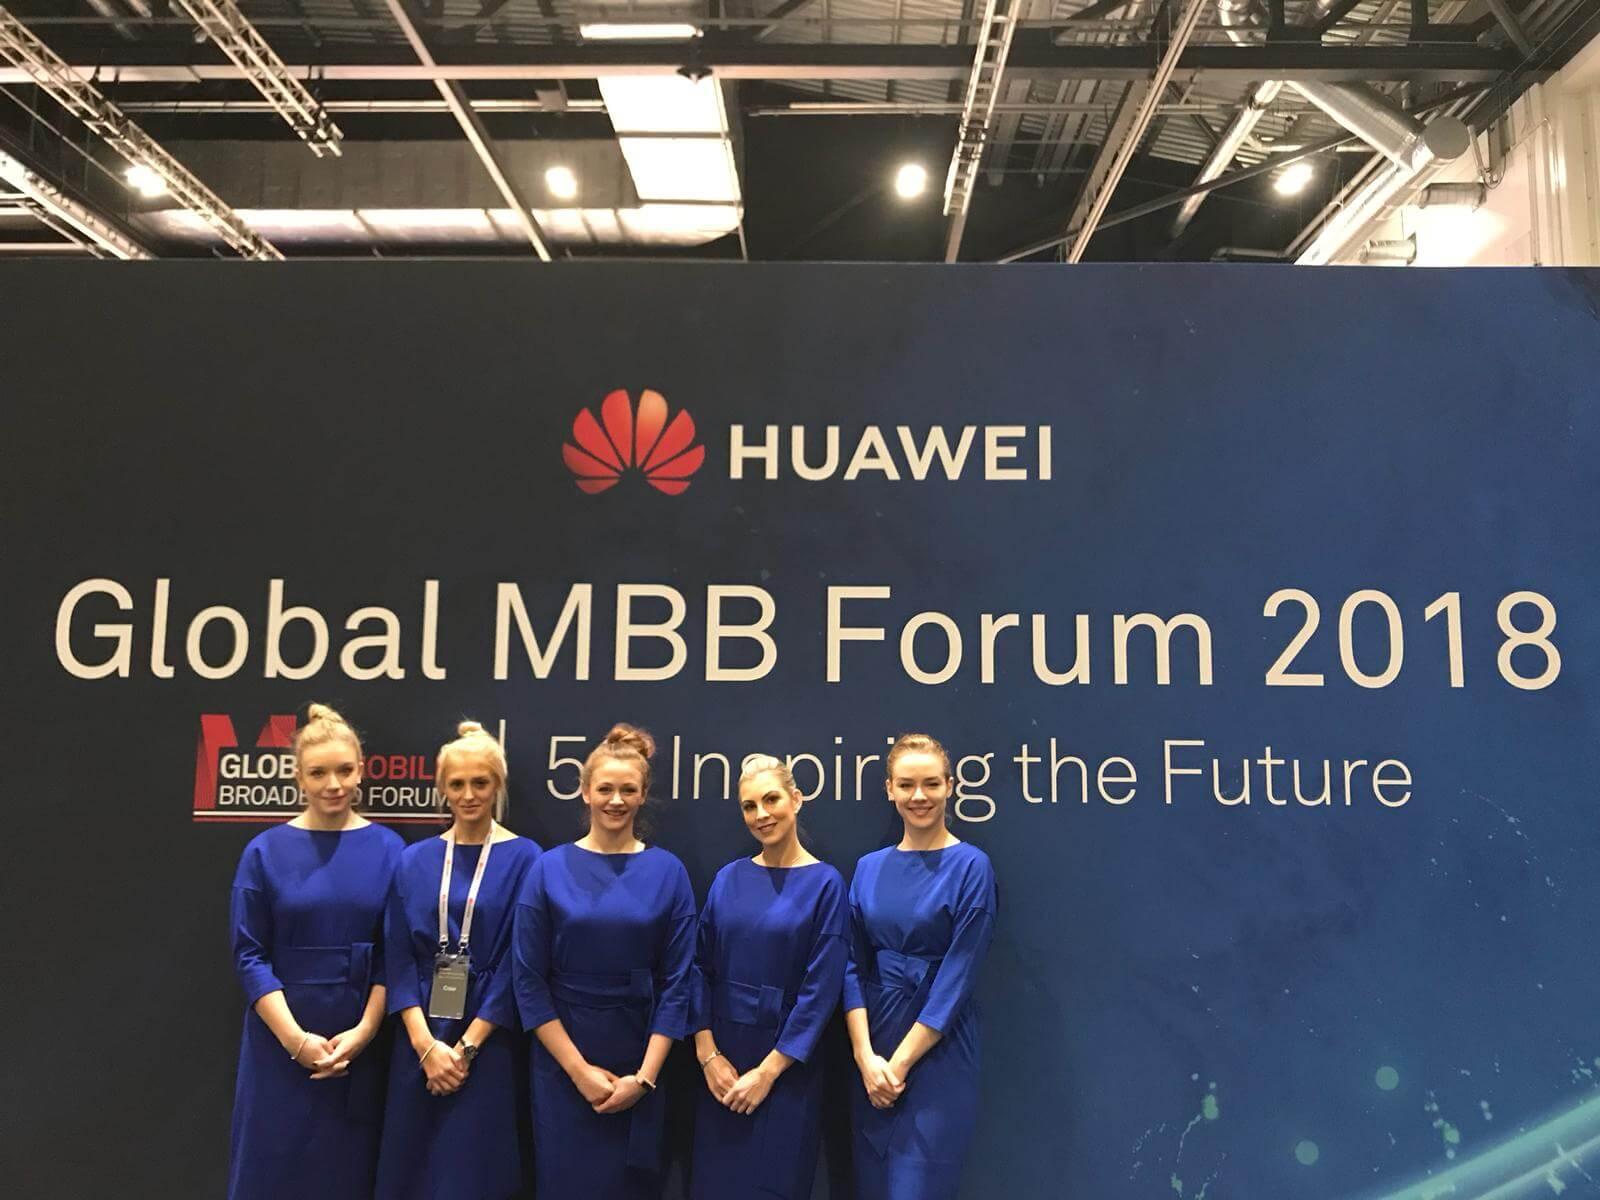 Huawei Global MBB Forum Hostesses